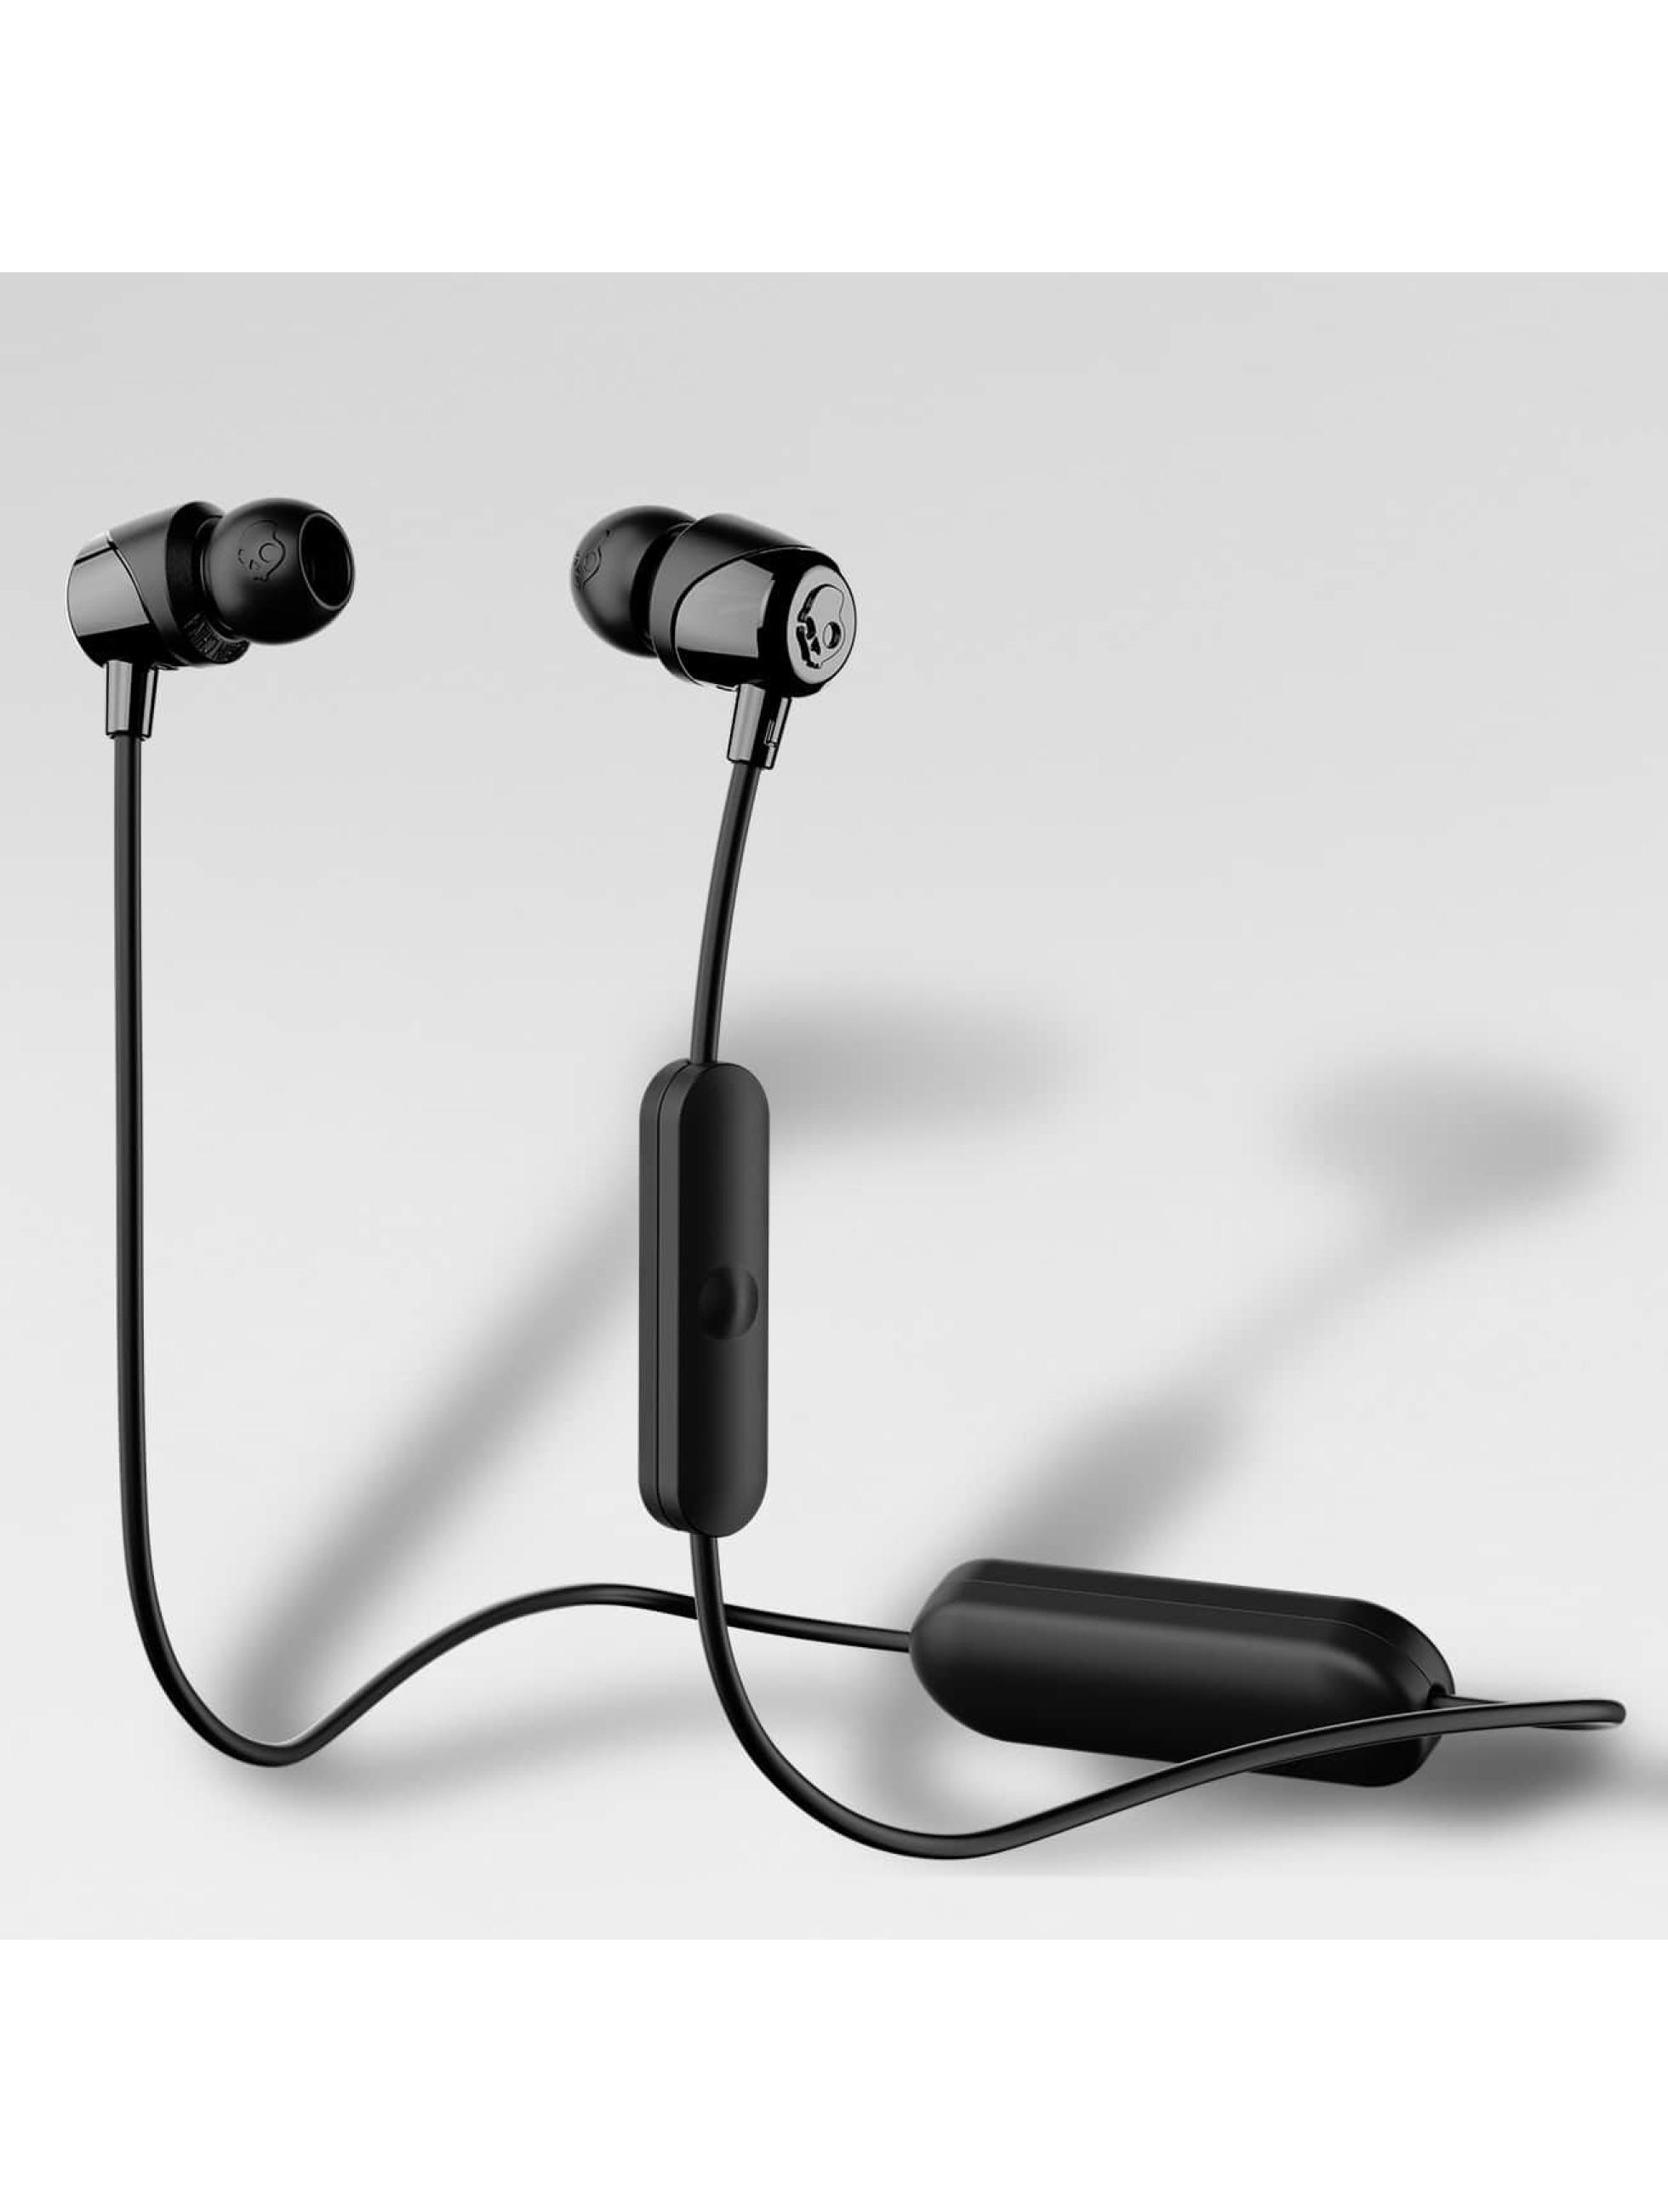 Skullcandy Kopfhörer JIB Wireless In schwarz